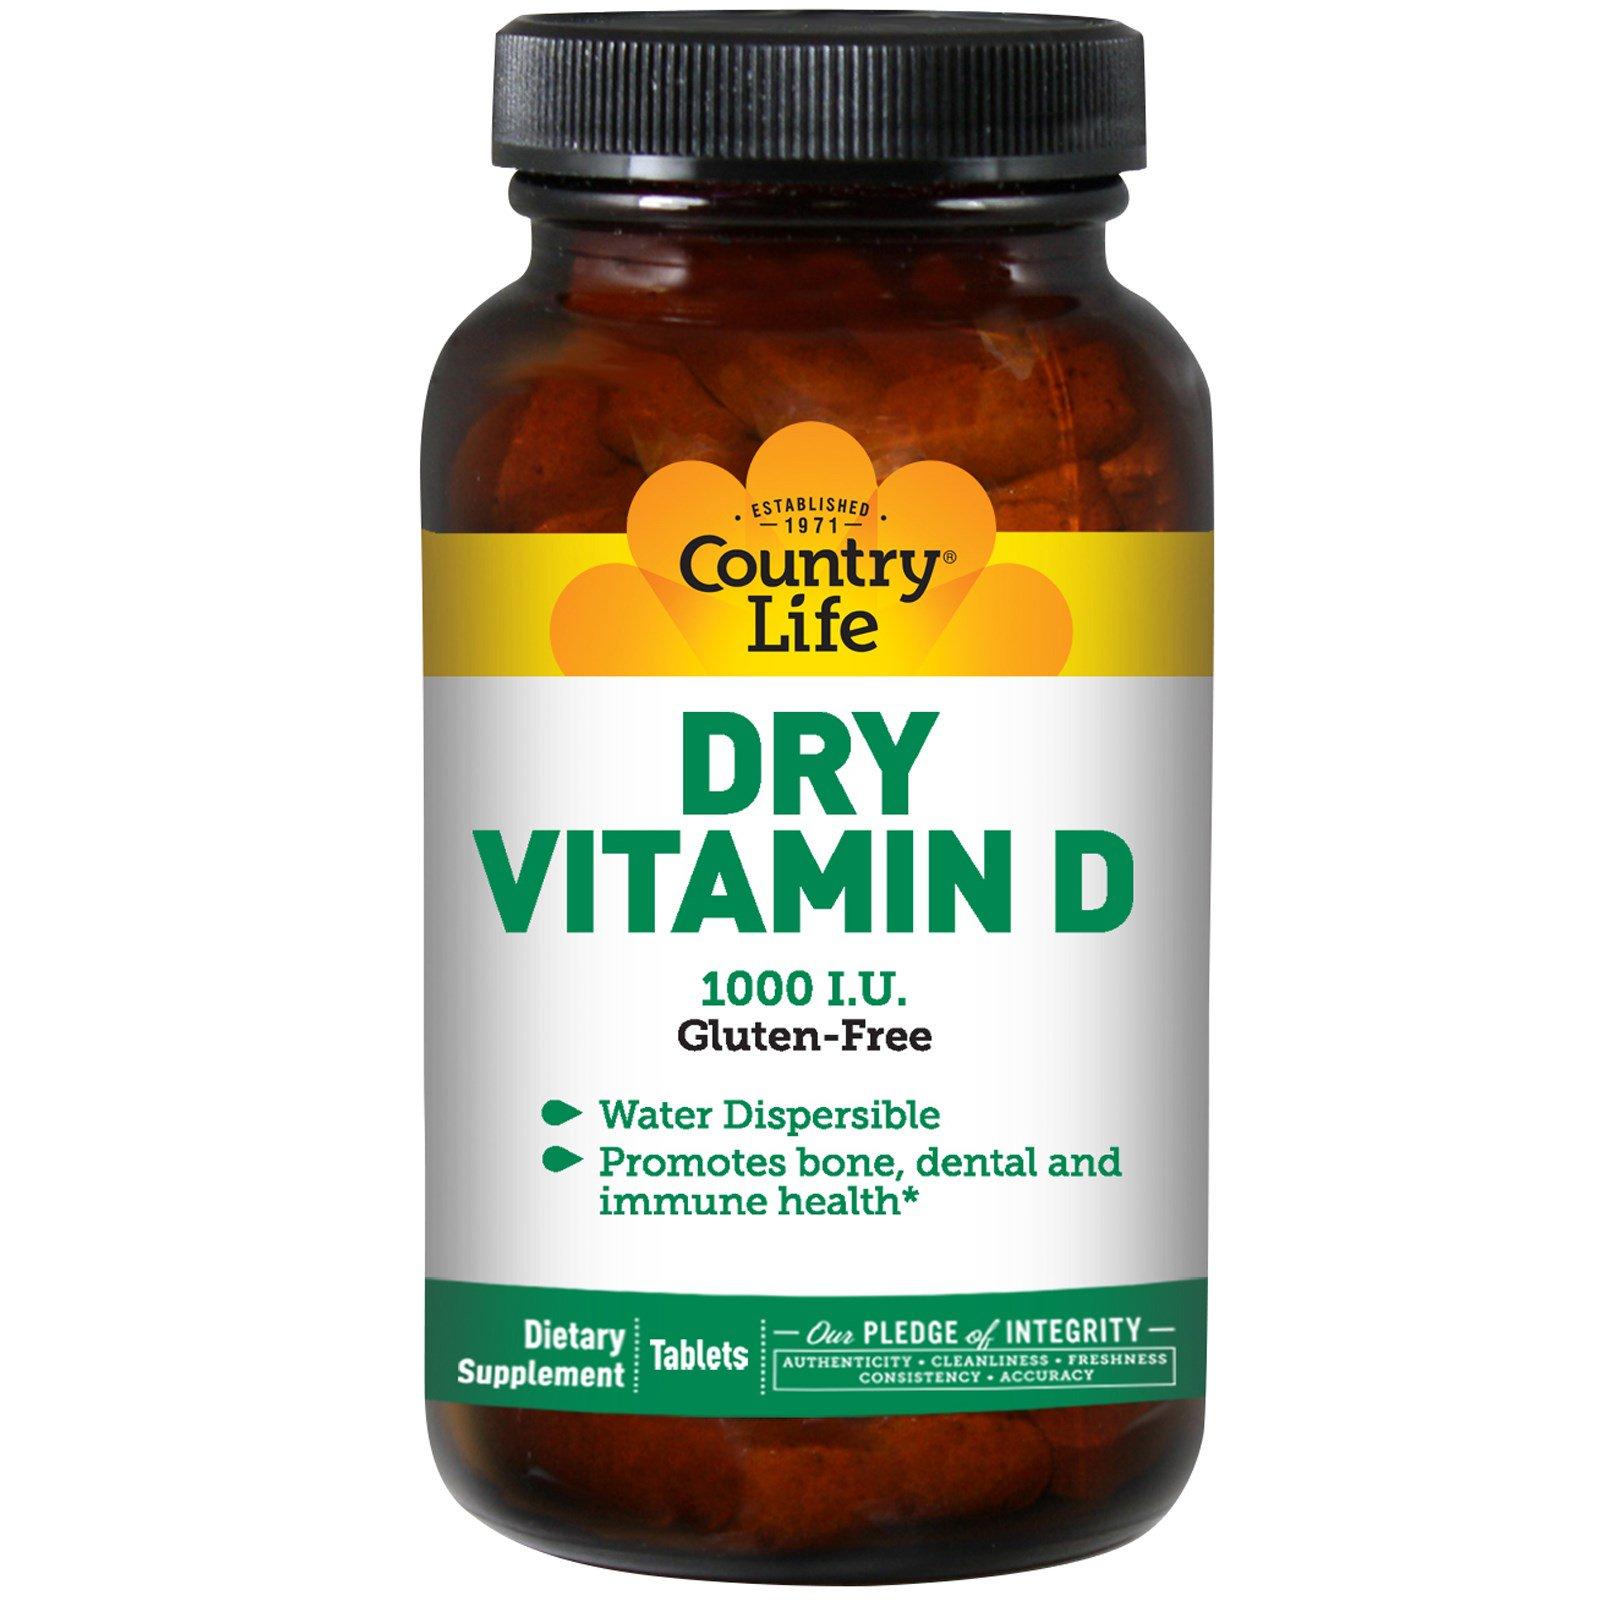 Country Life, Сухой витамин D, 1000 международных единиц, 100 таблеток